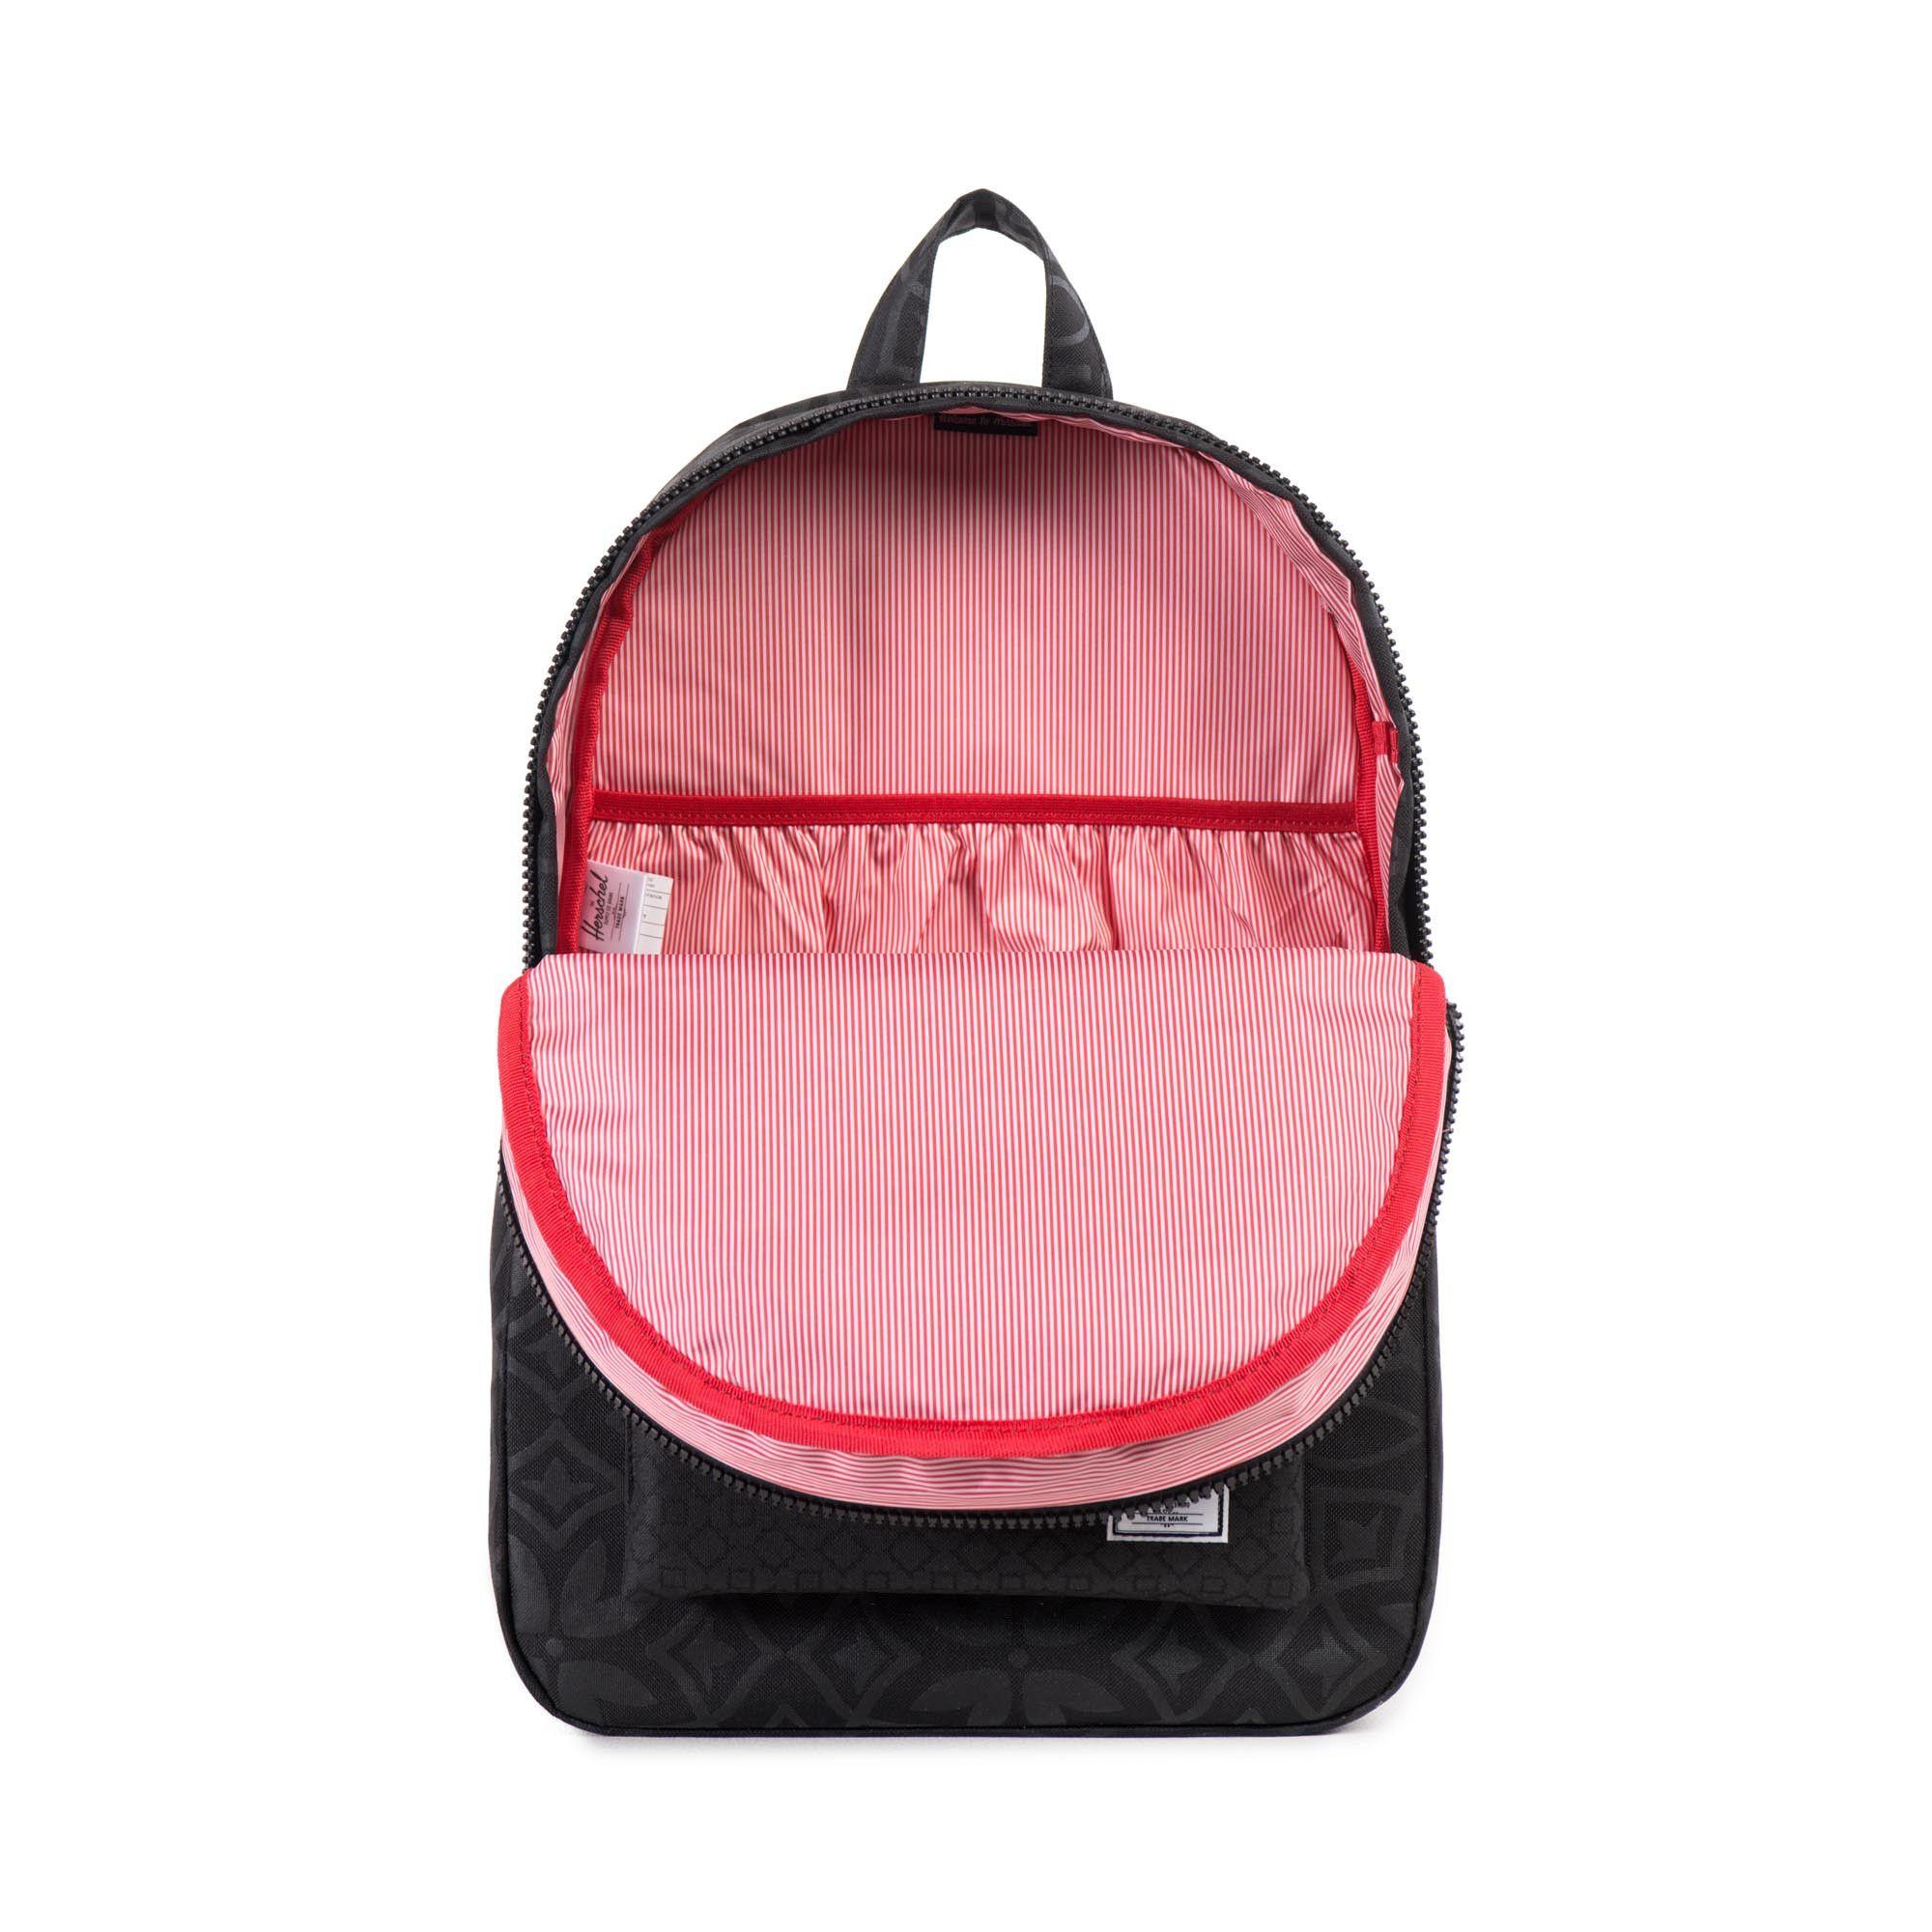 949684d7571 Free shipping · Settlement Backpack